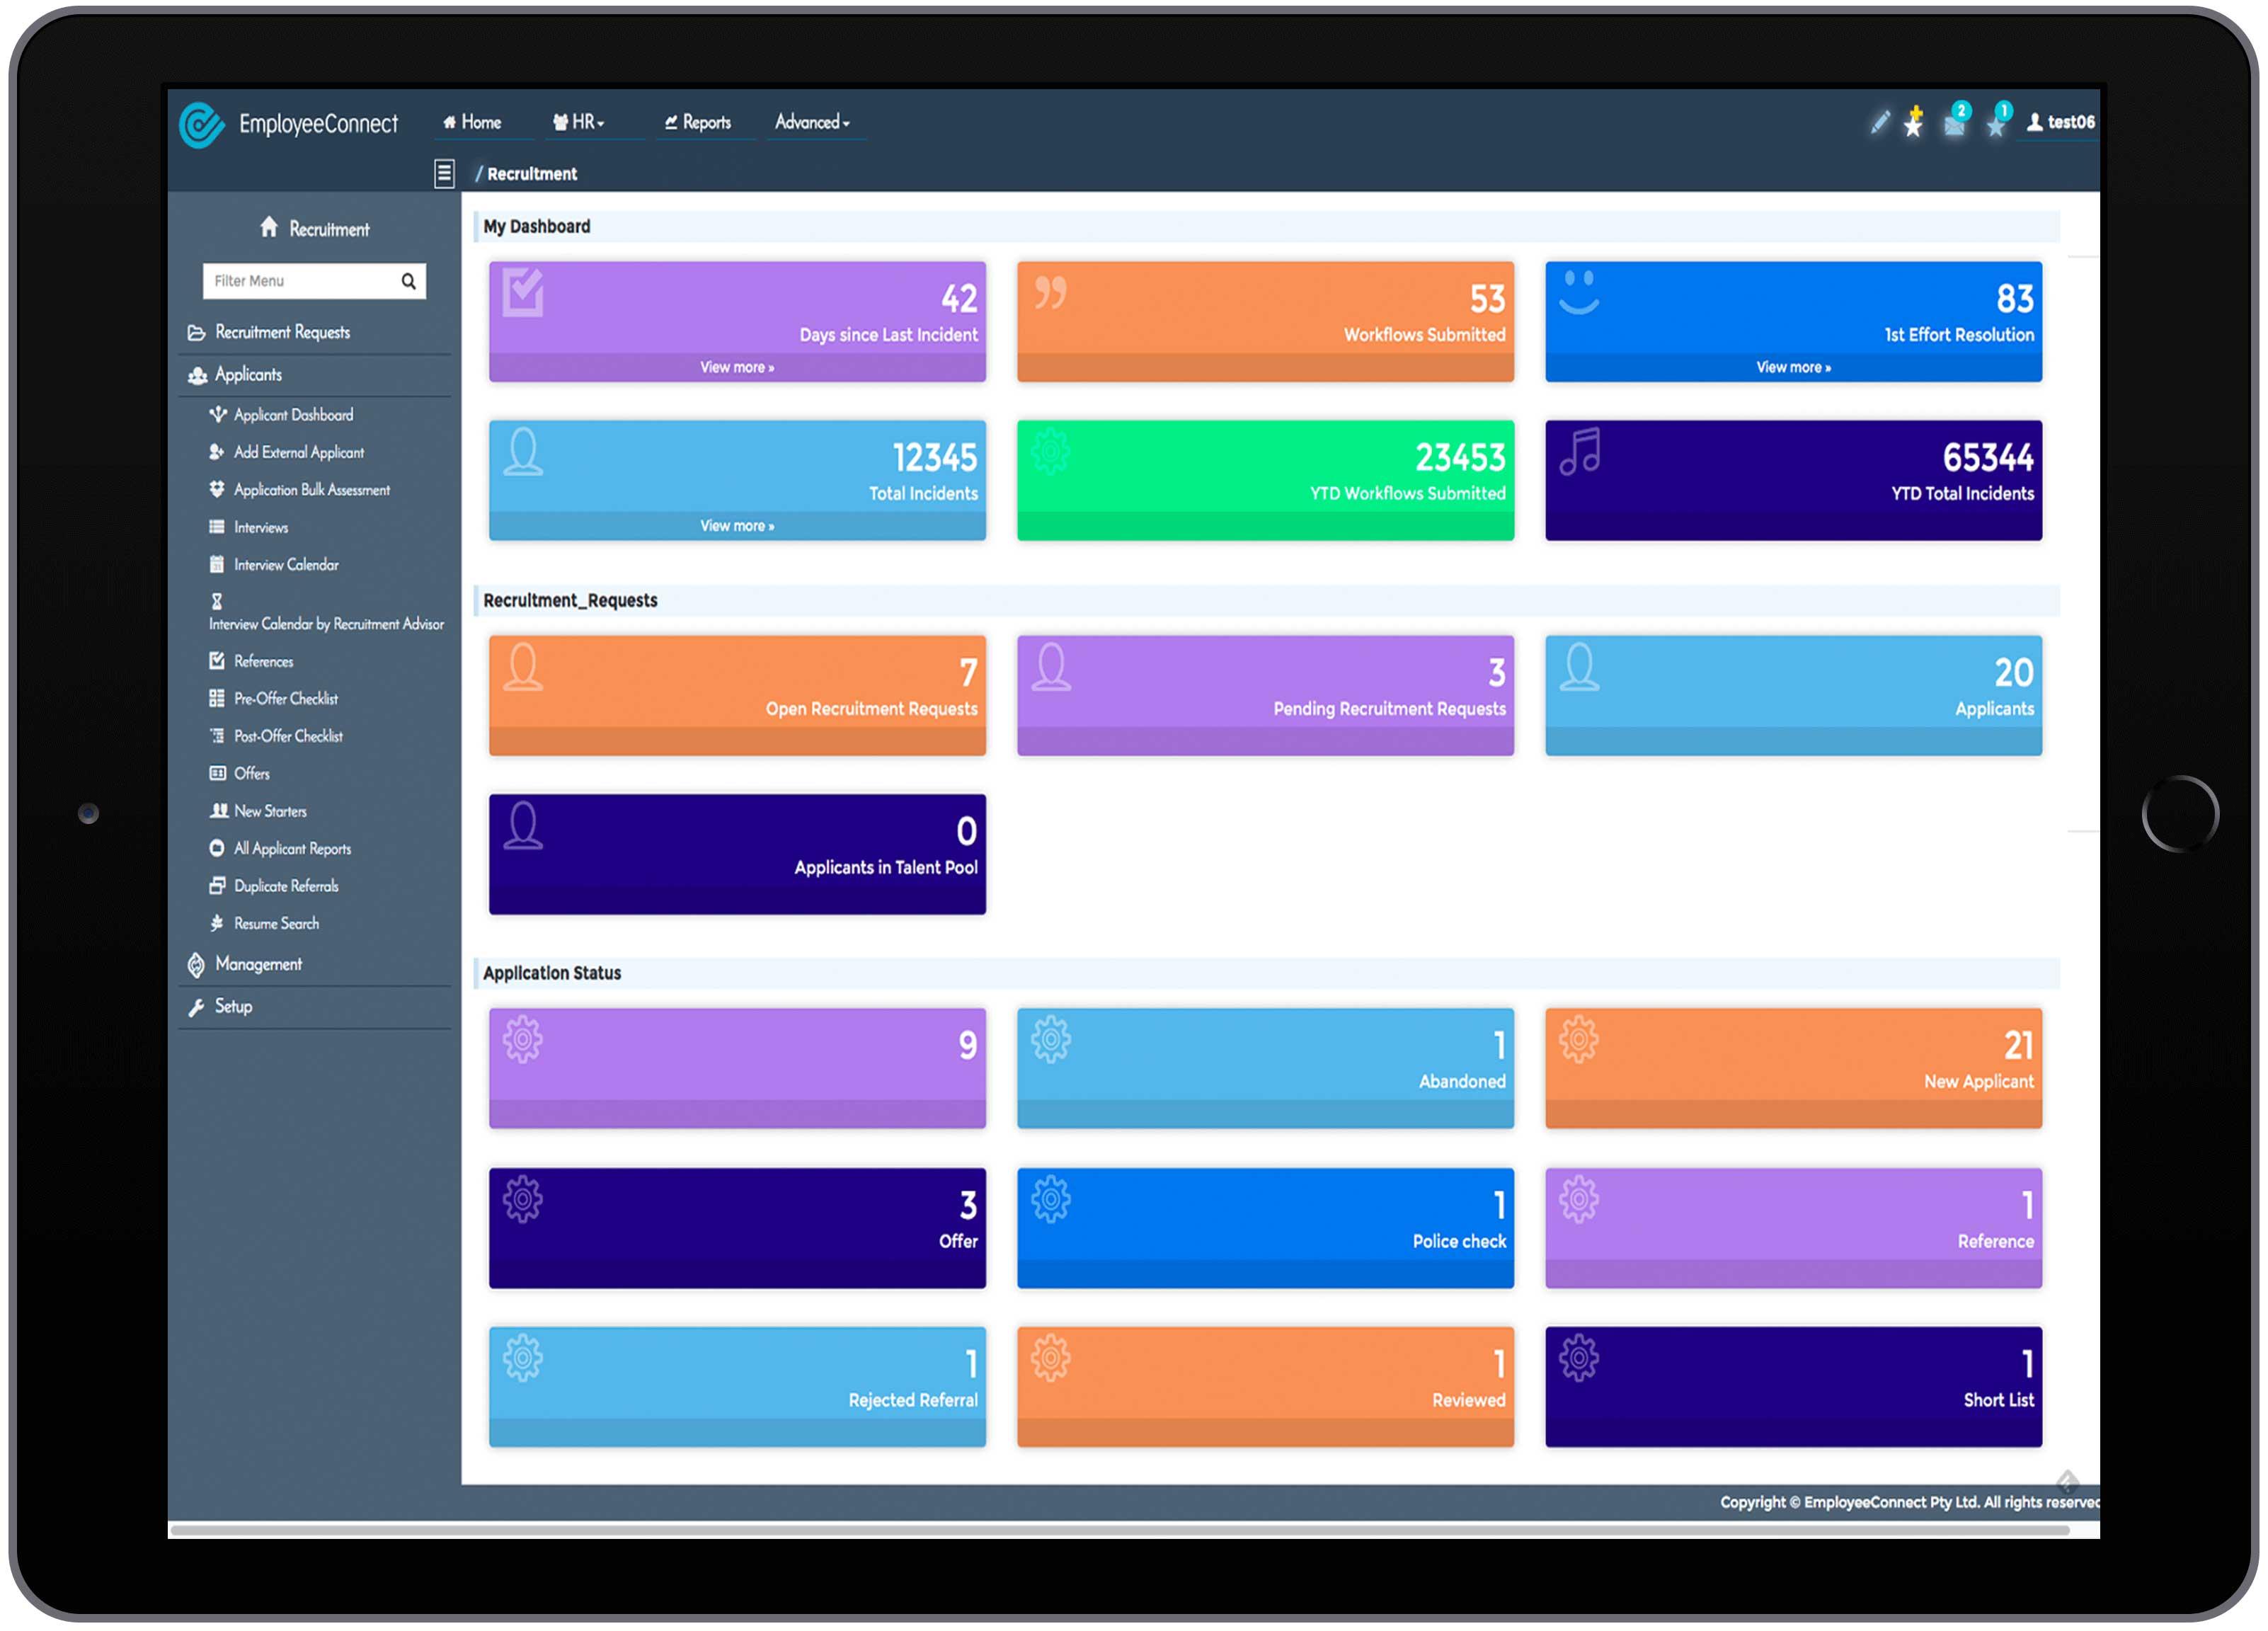 HR Recruitment Dashboard with Metrics - EmployeeConnect HRIS